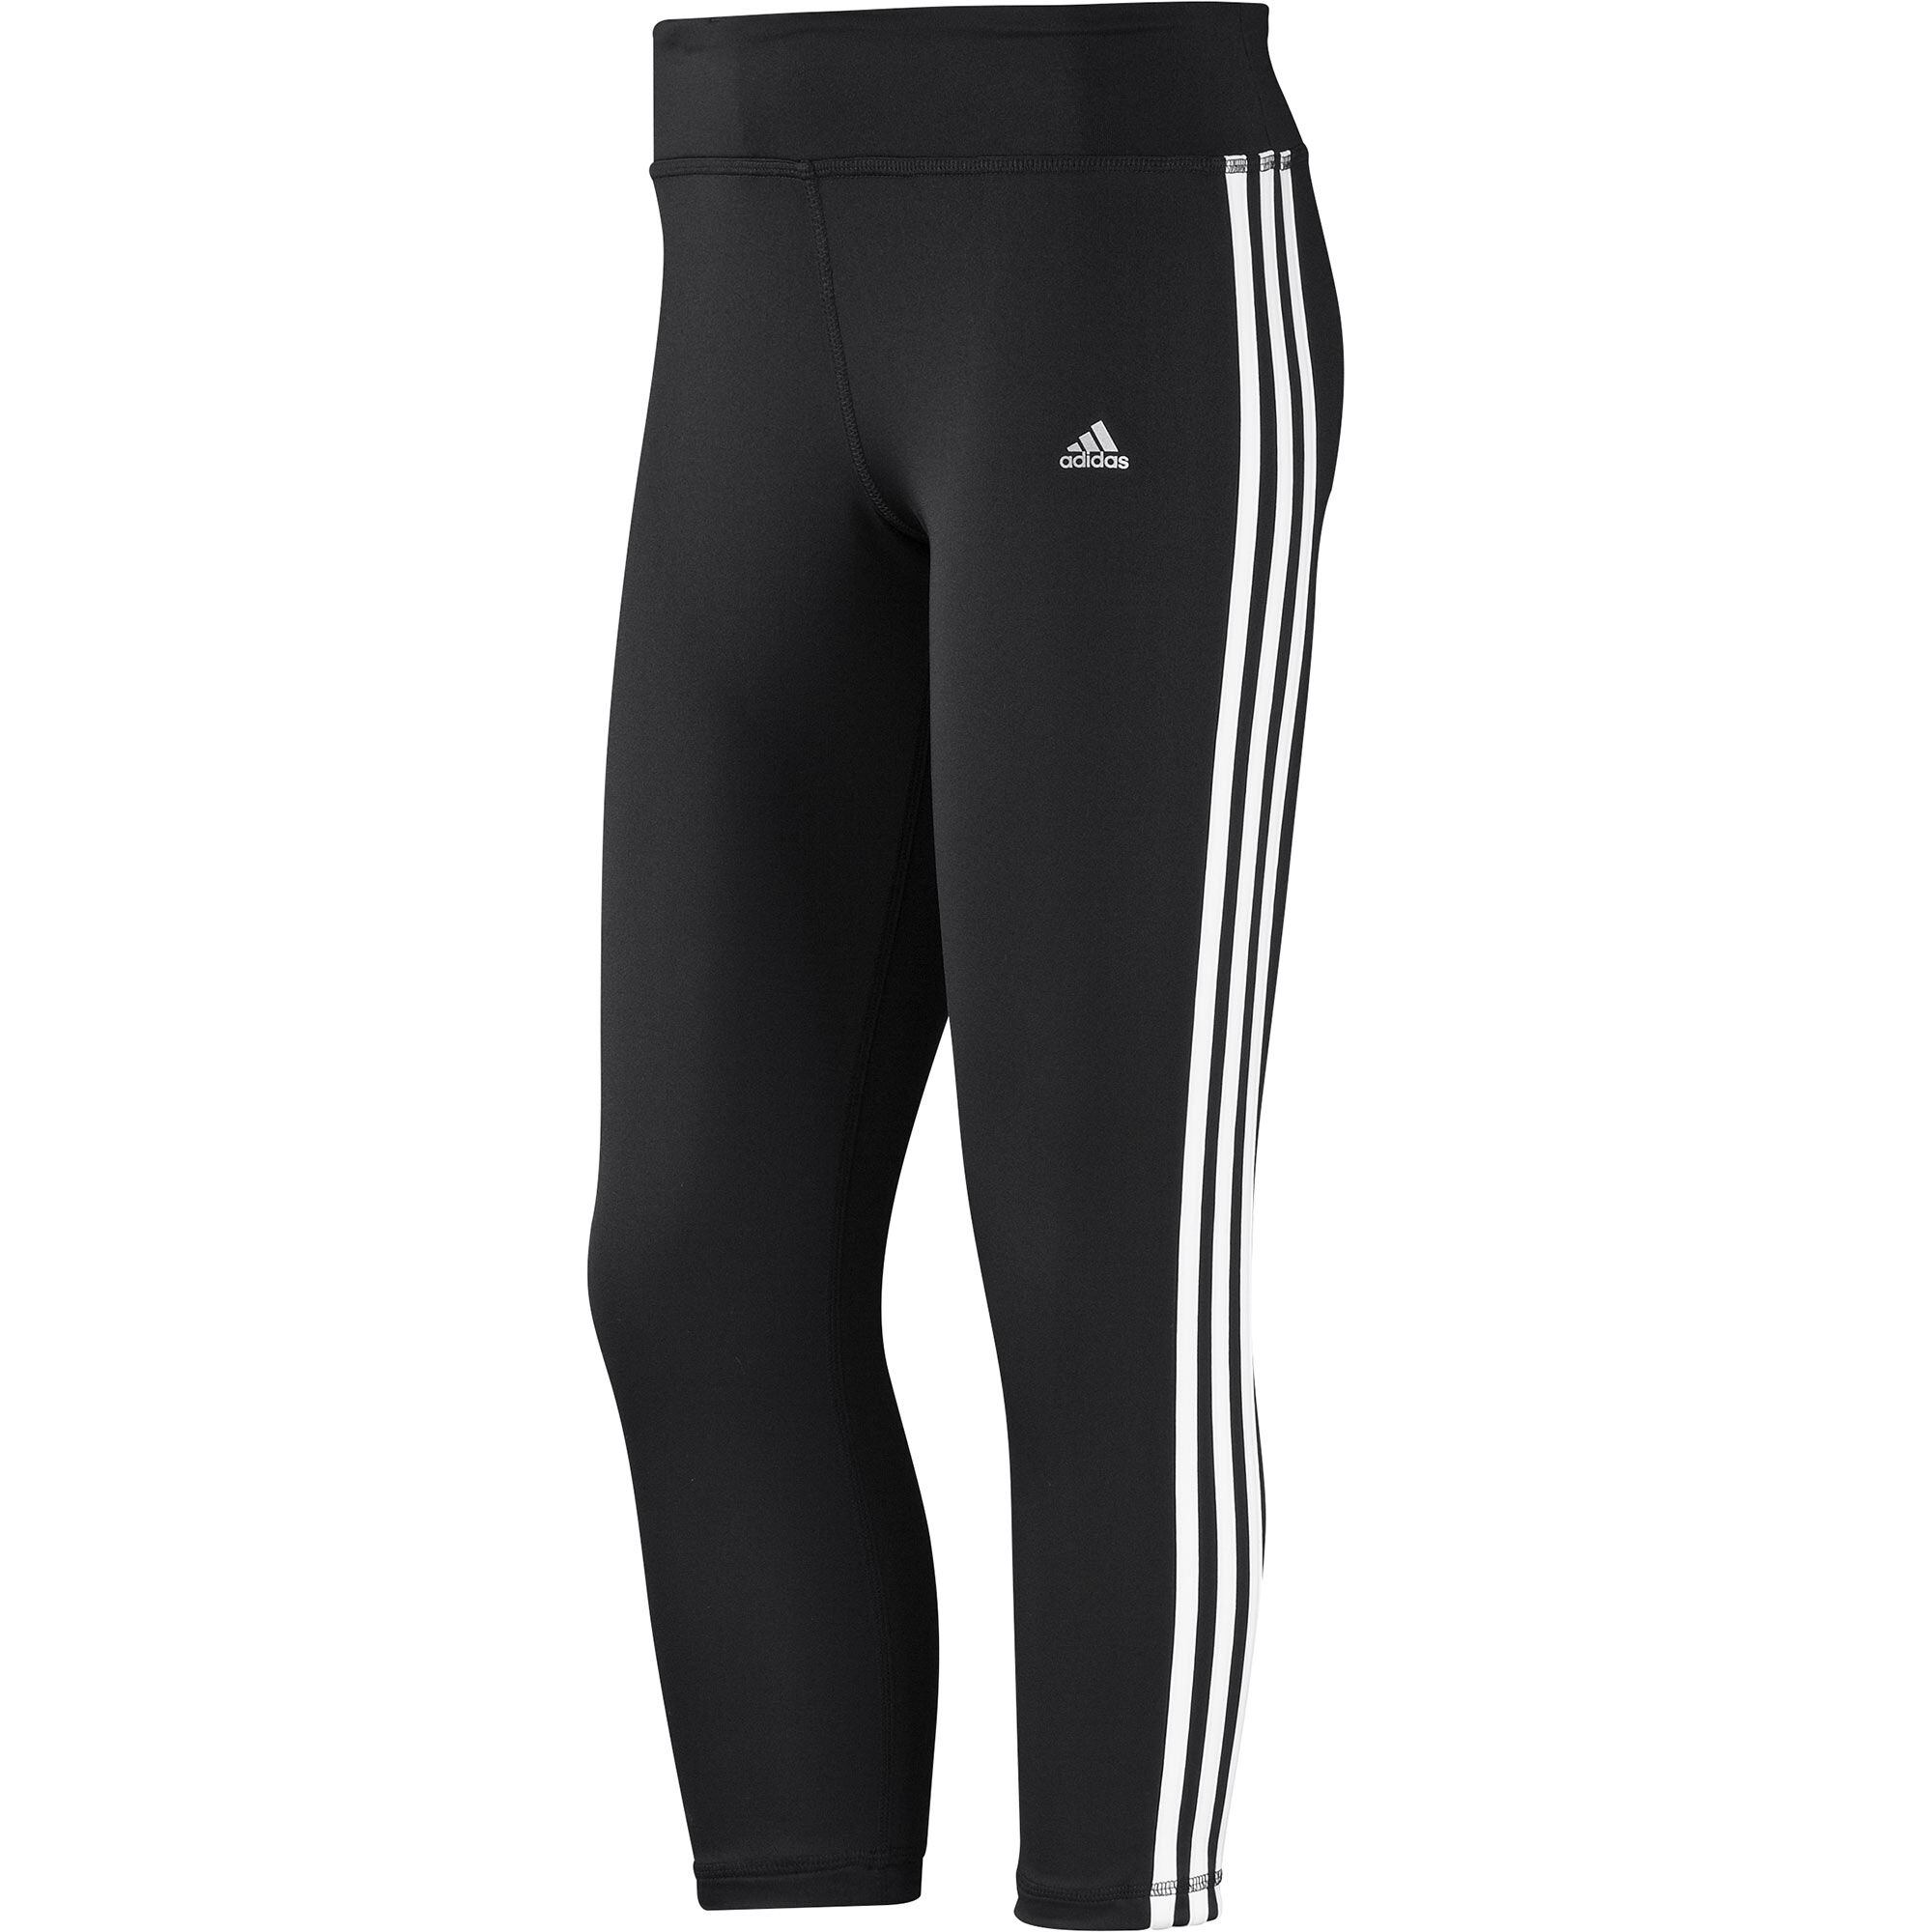 jogging adidas mujer jogging babuchas pantalon adidas mujer gimnasia deportivos d nq np 588511 mla20. Black Bedroom Furniture Sets. Home Design Ideas